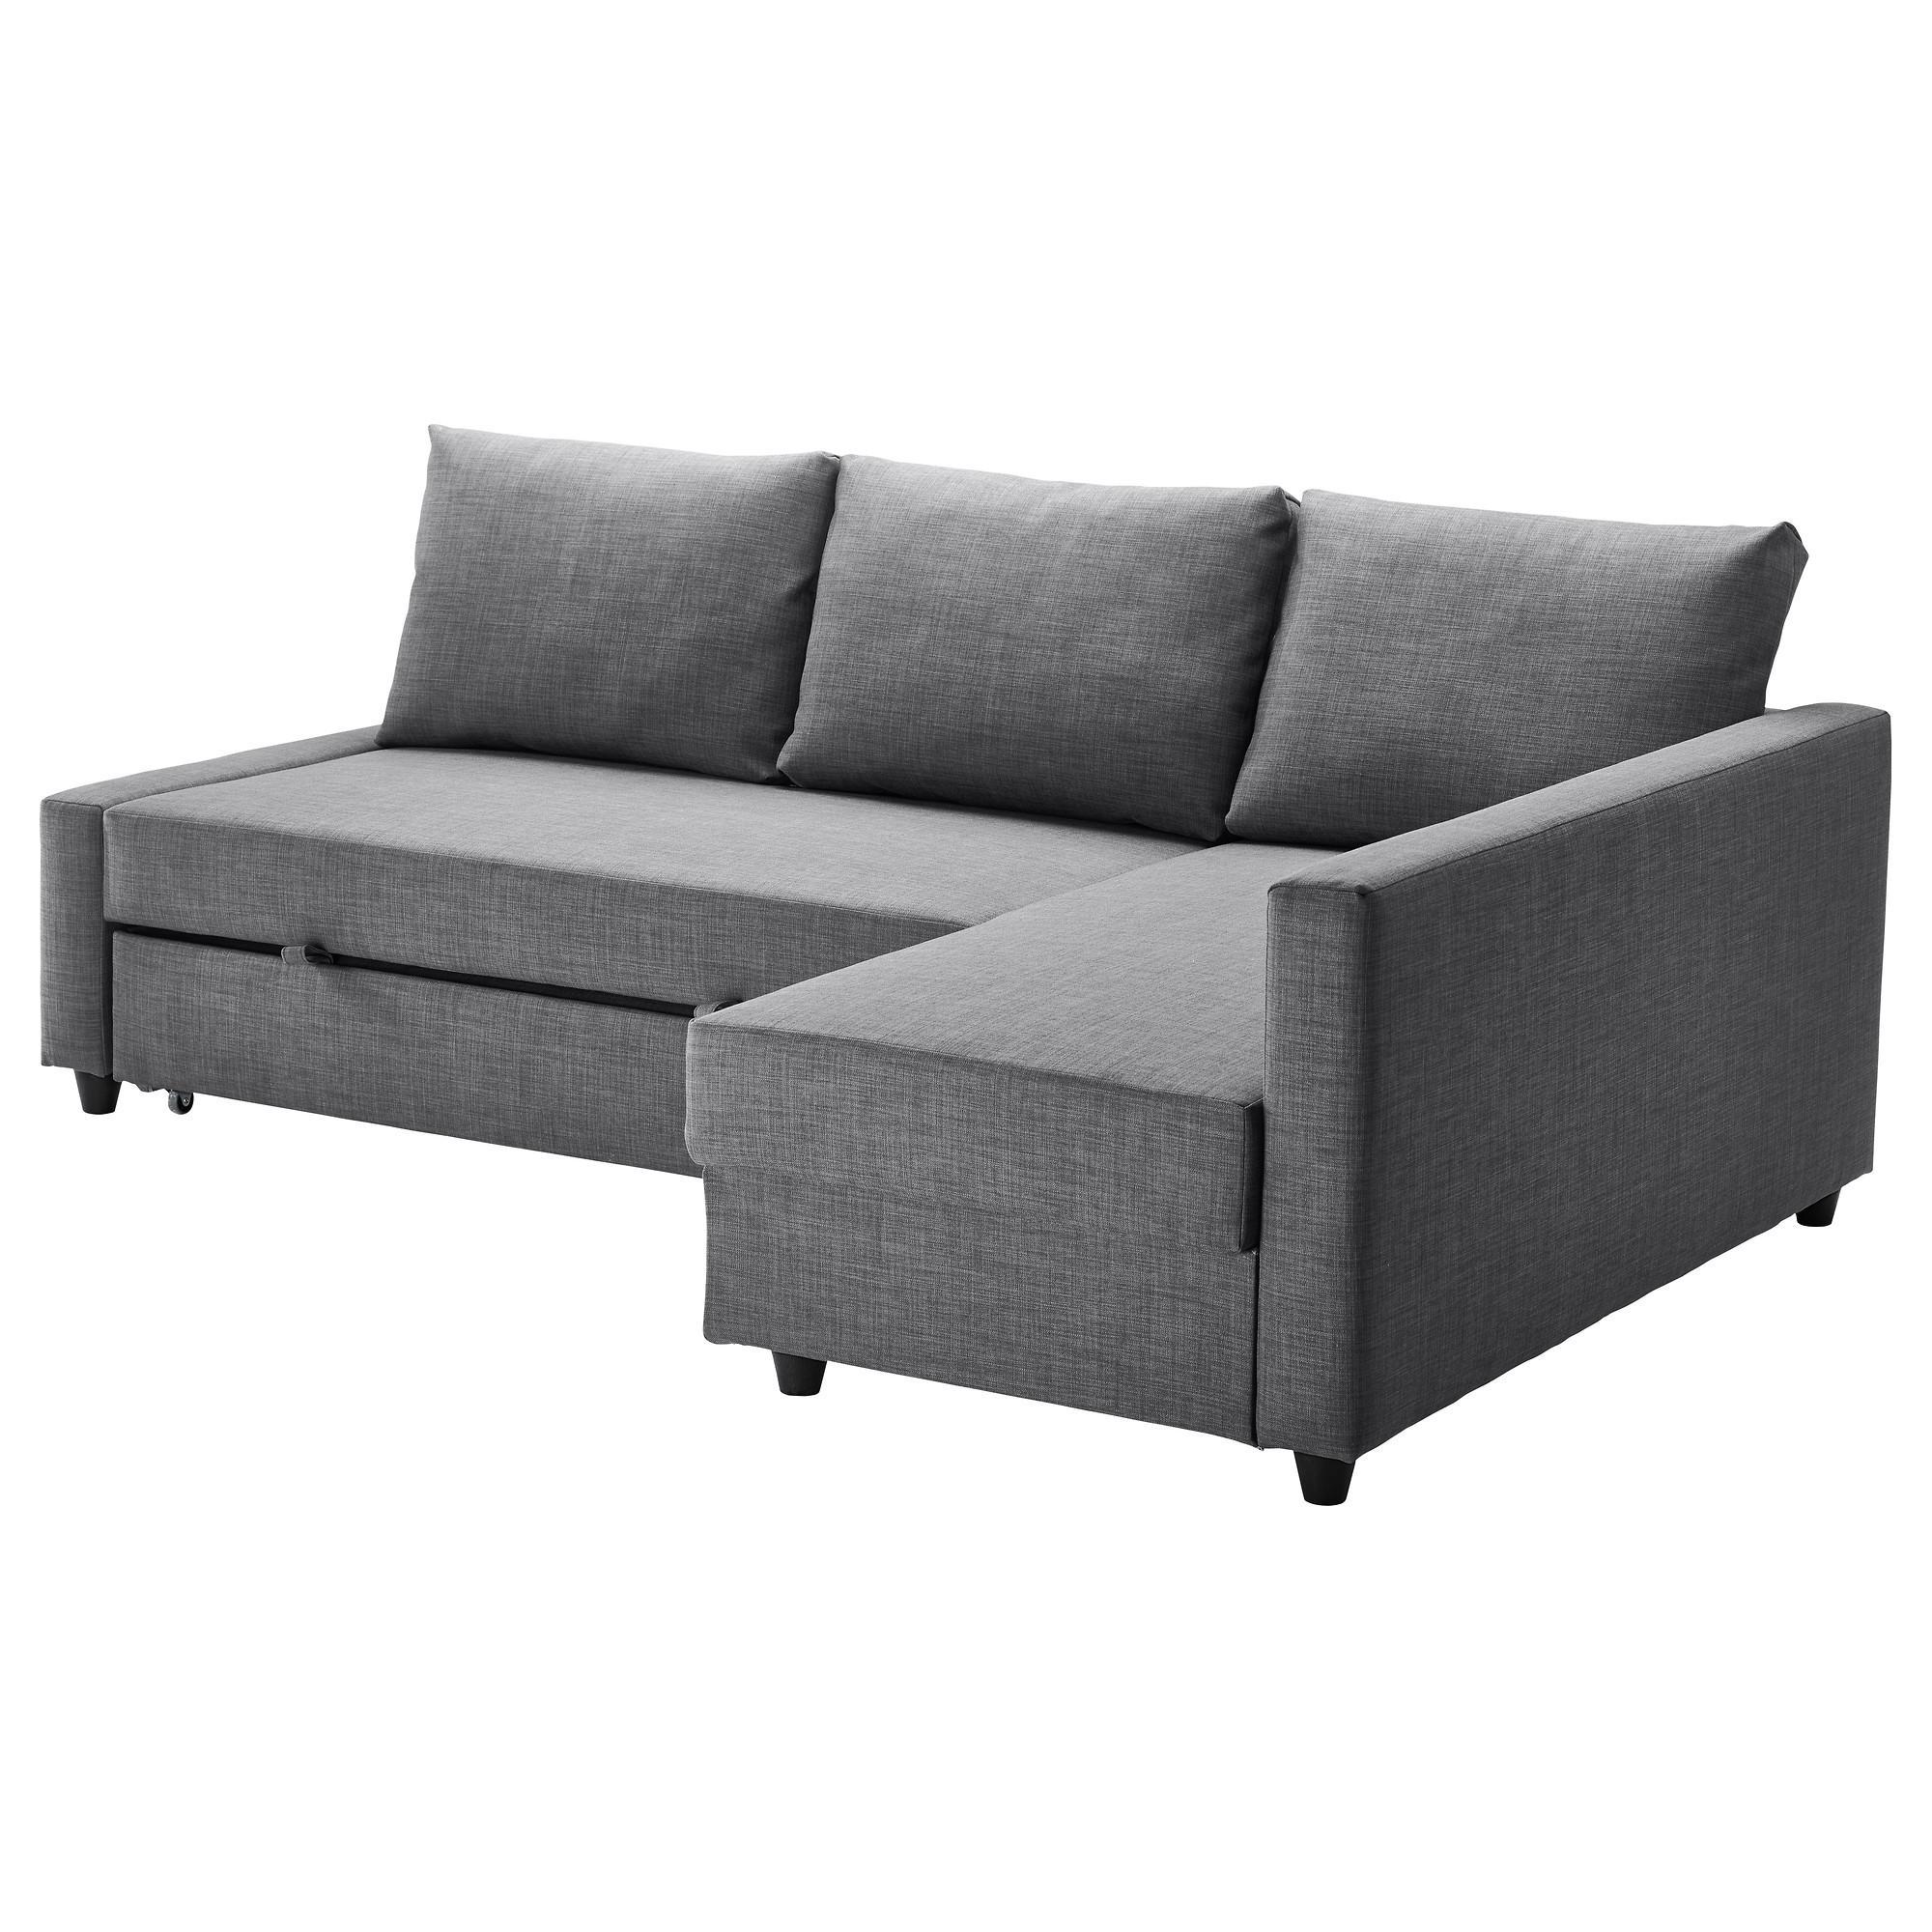 Sofa Beds & Futons - Ikea in Sofa Convertibles